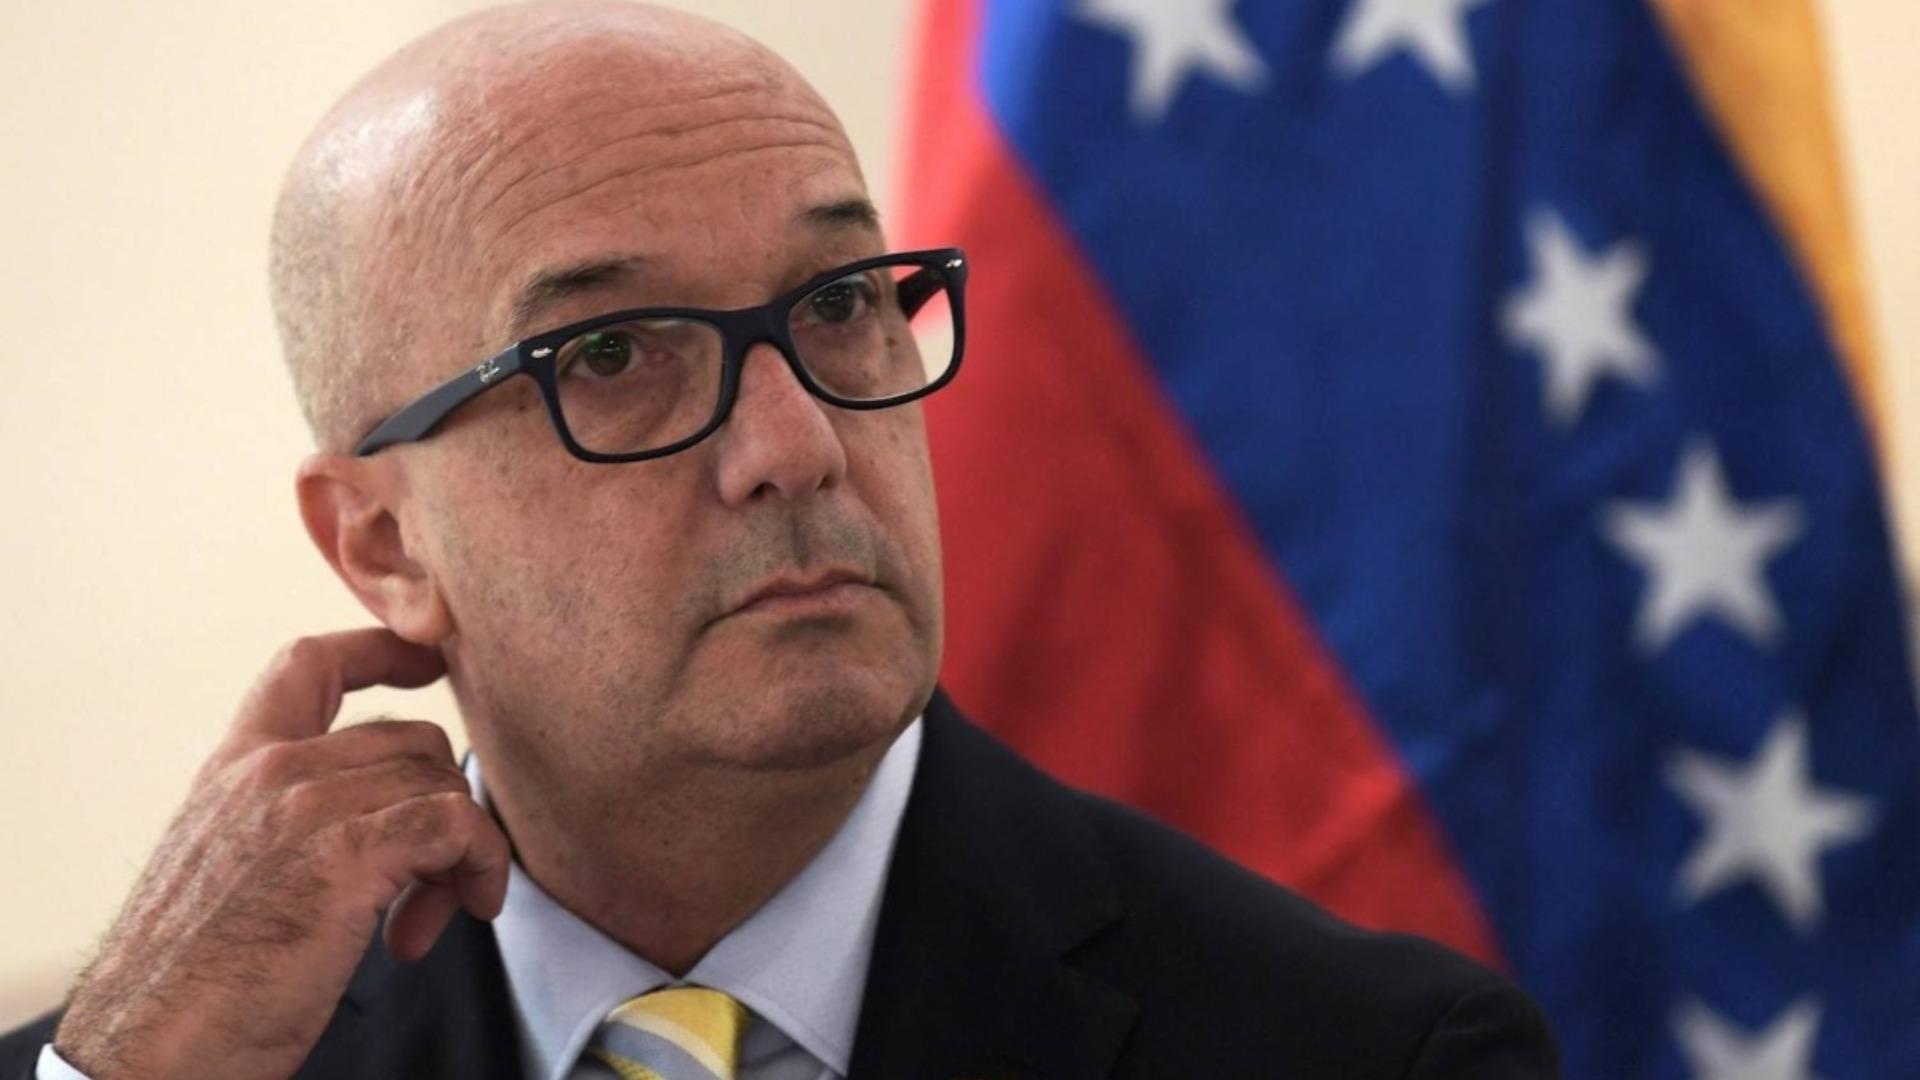 Simonovis entregó lista a EE UU de funcionarios que se han beneficiado del régimen